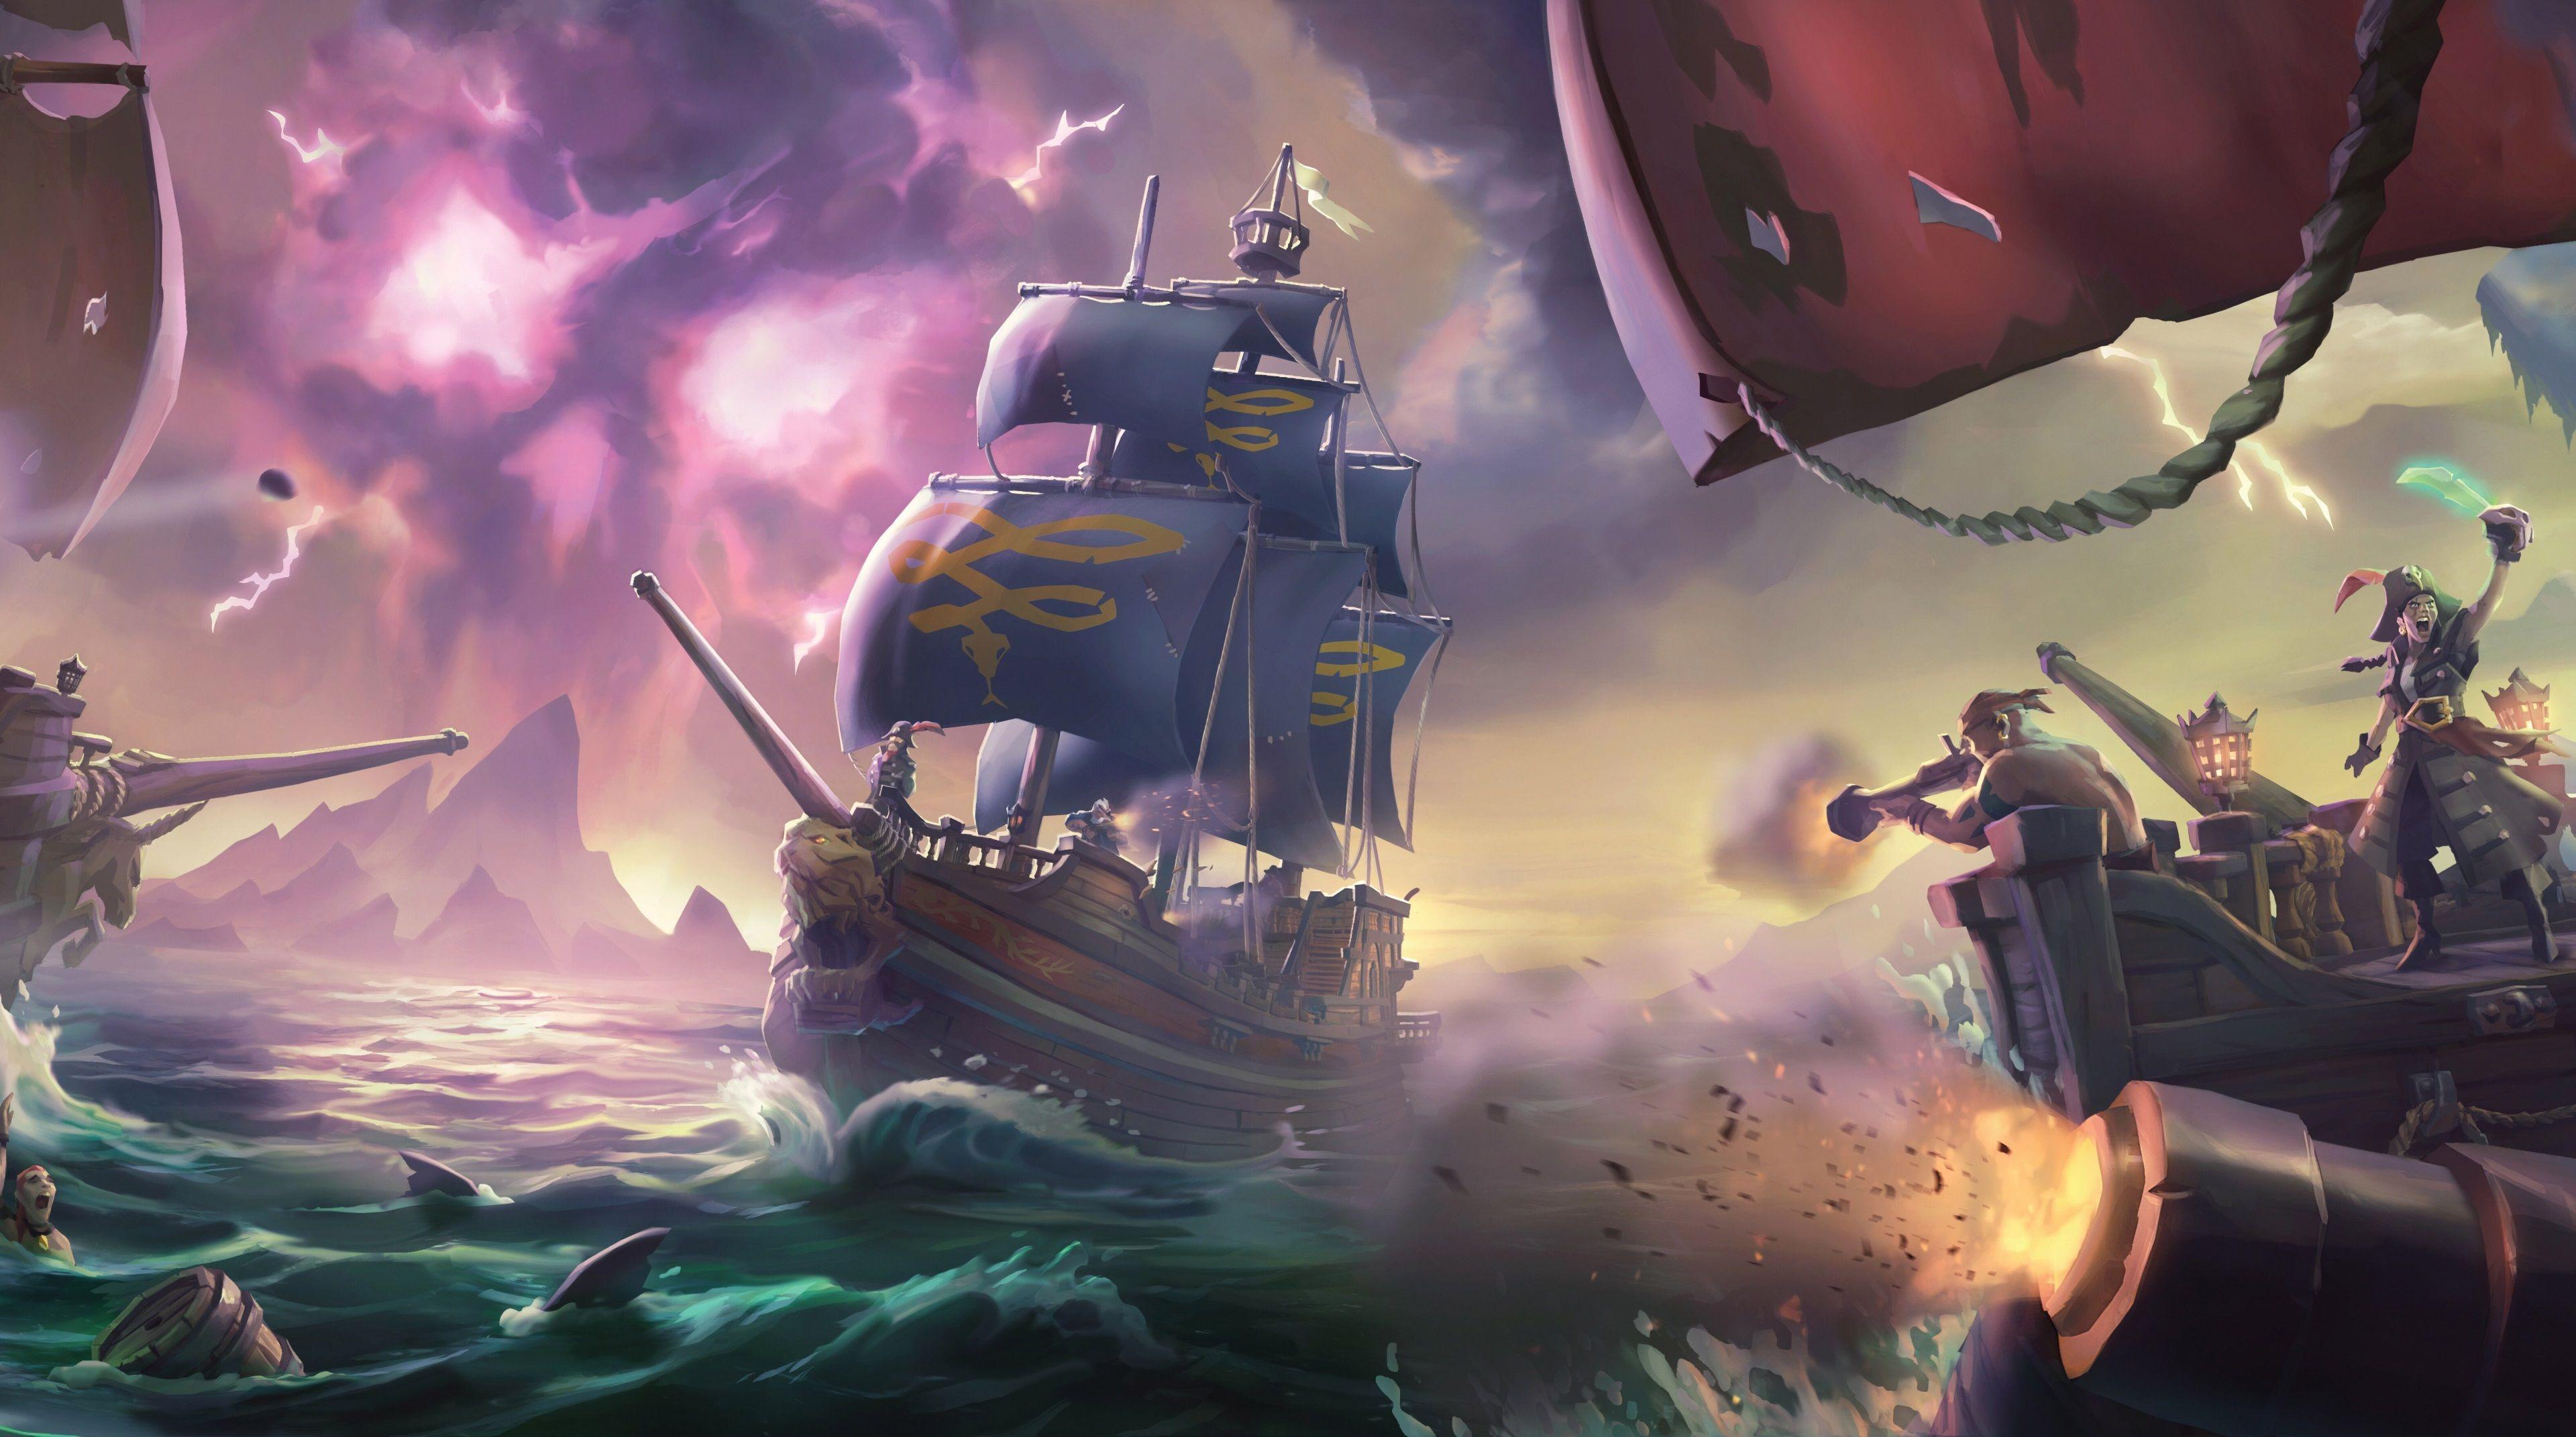 3840x2142 sea of thieves 4k background wallpaper free | sea